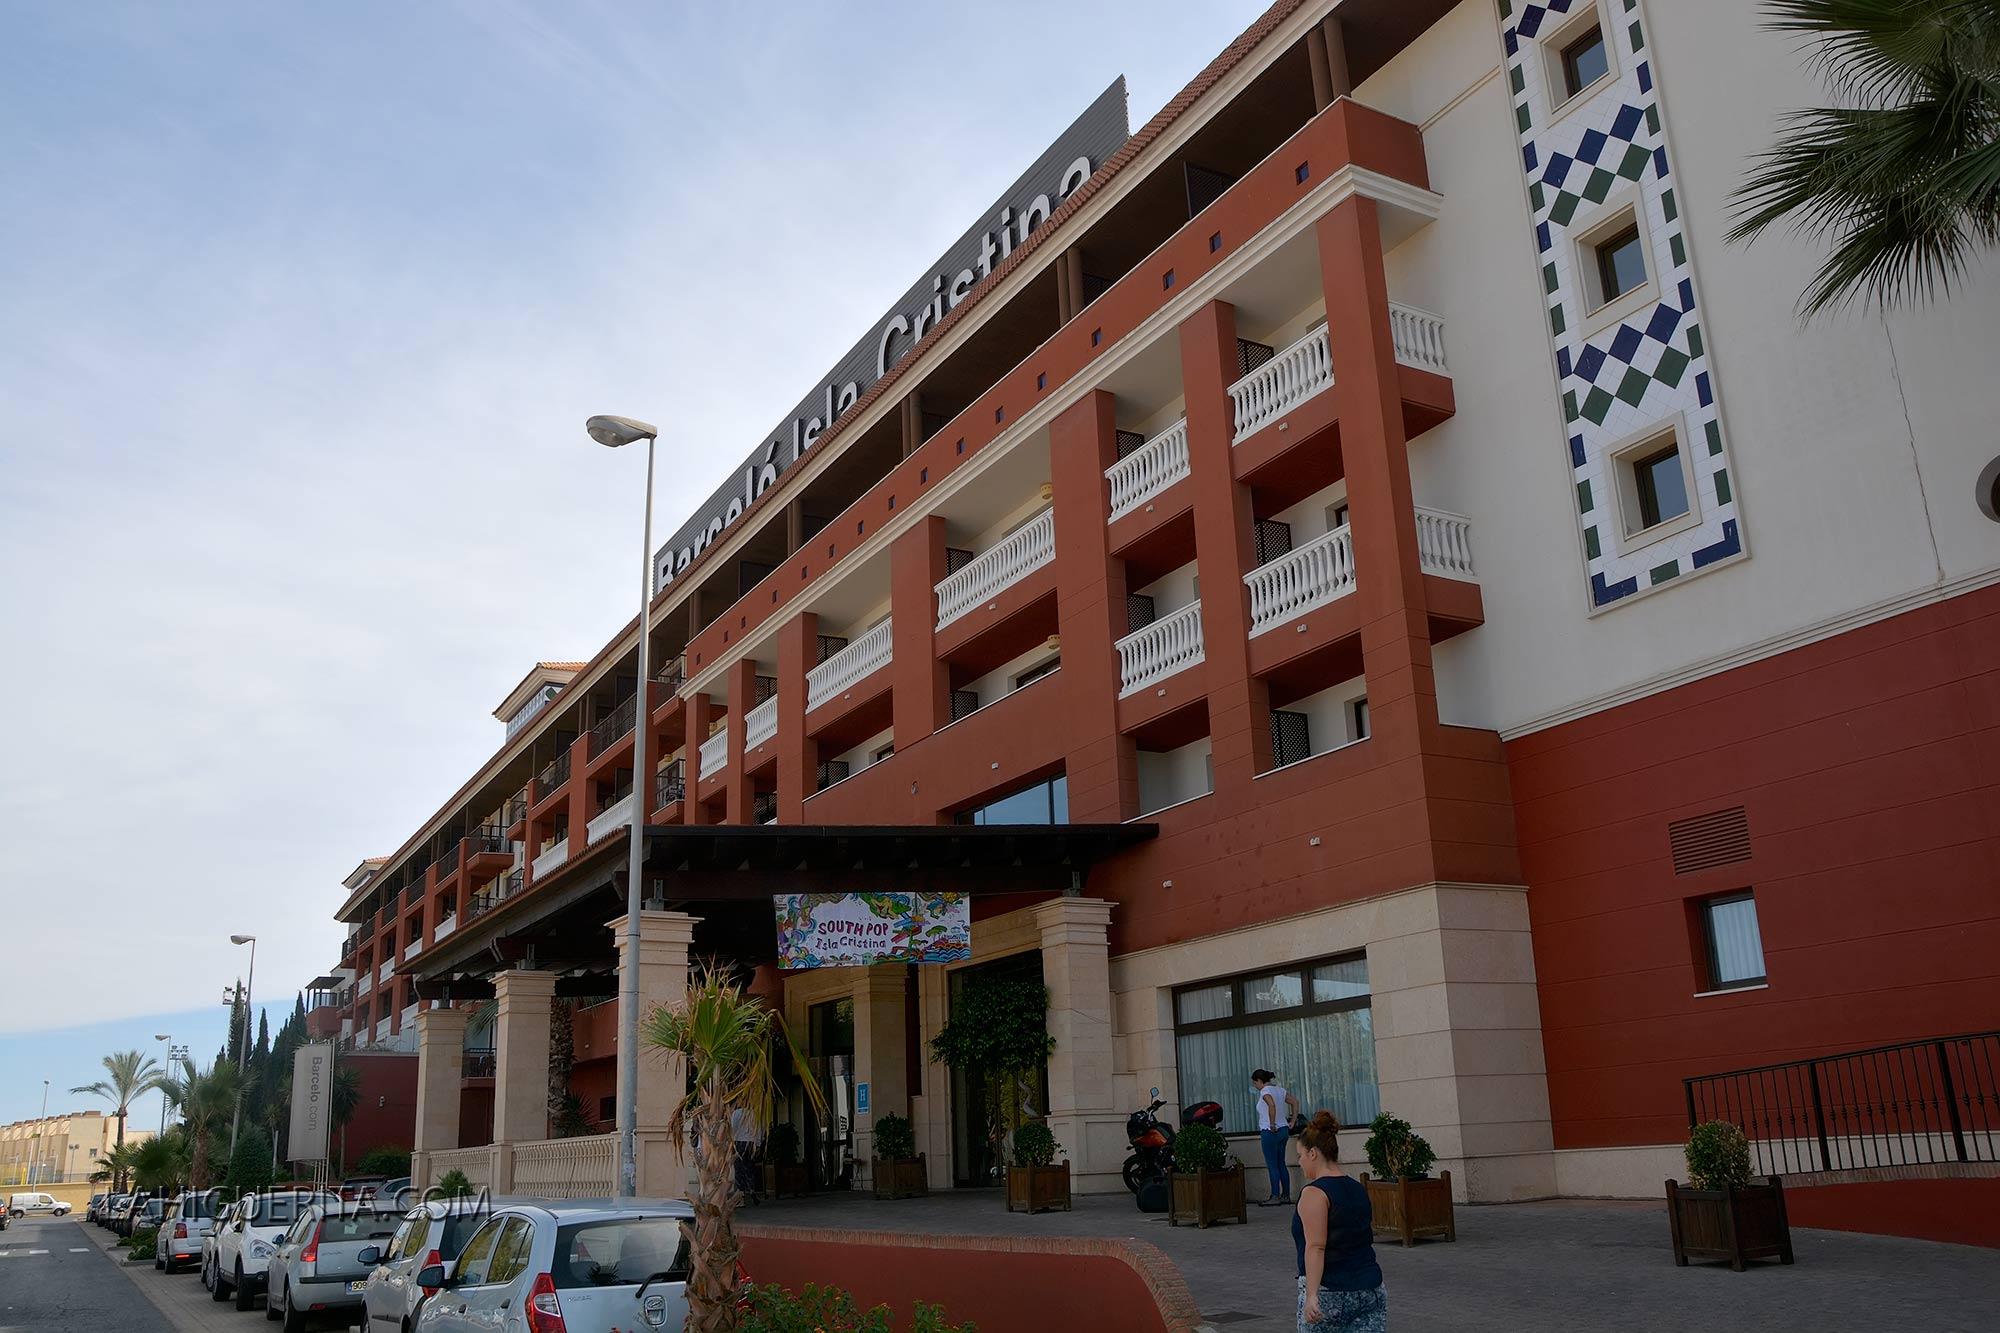 hotel-barcelo-southpop-2